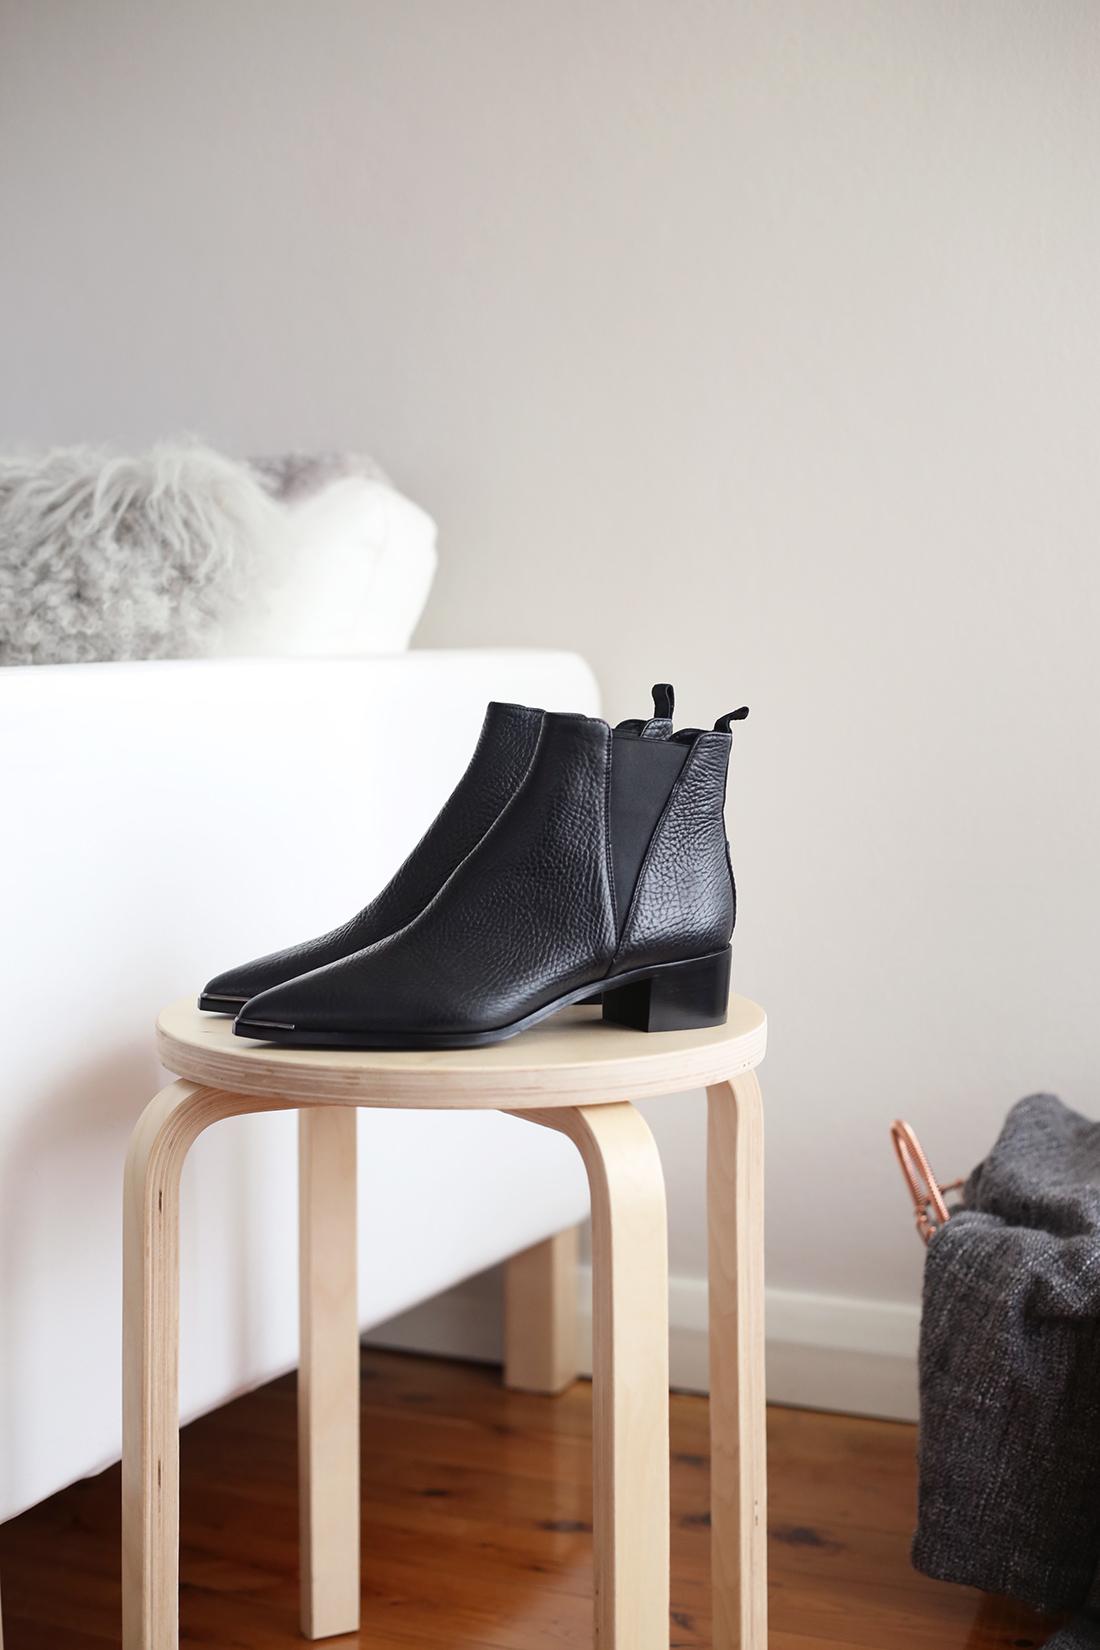 acne studios jensen boots grained leather